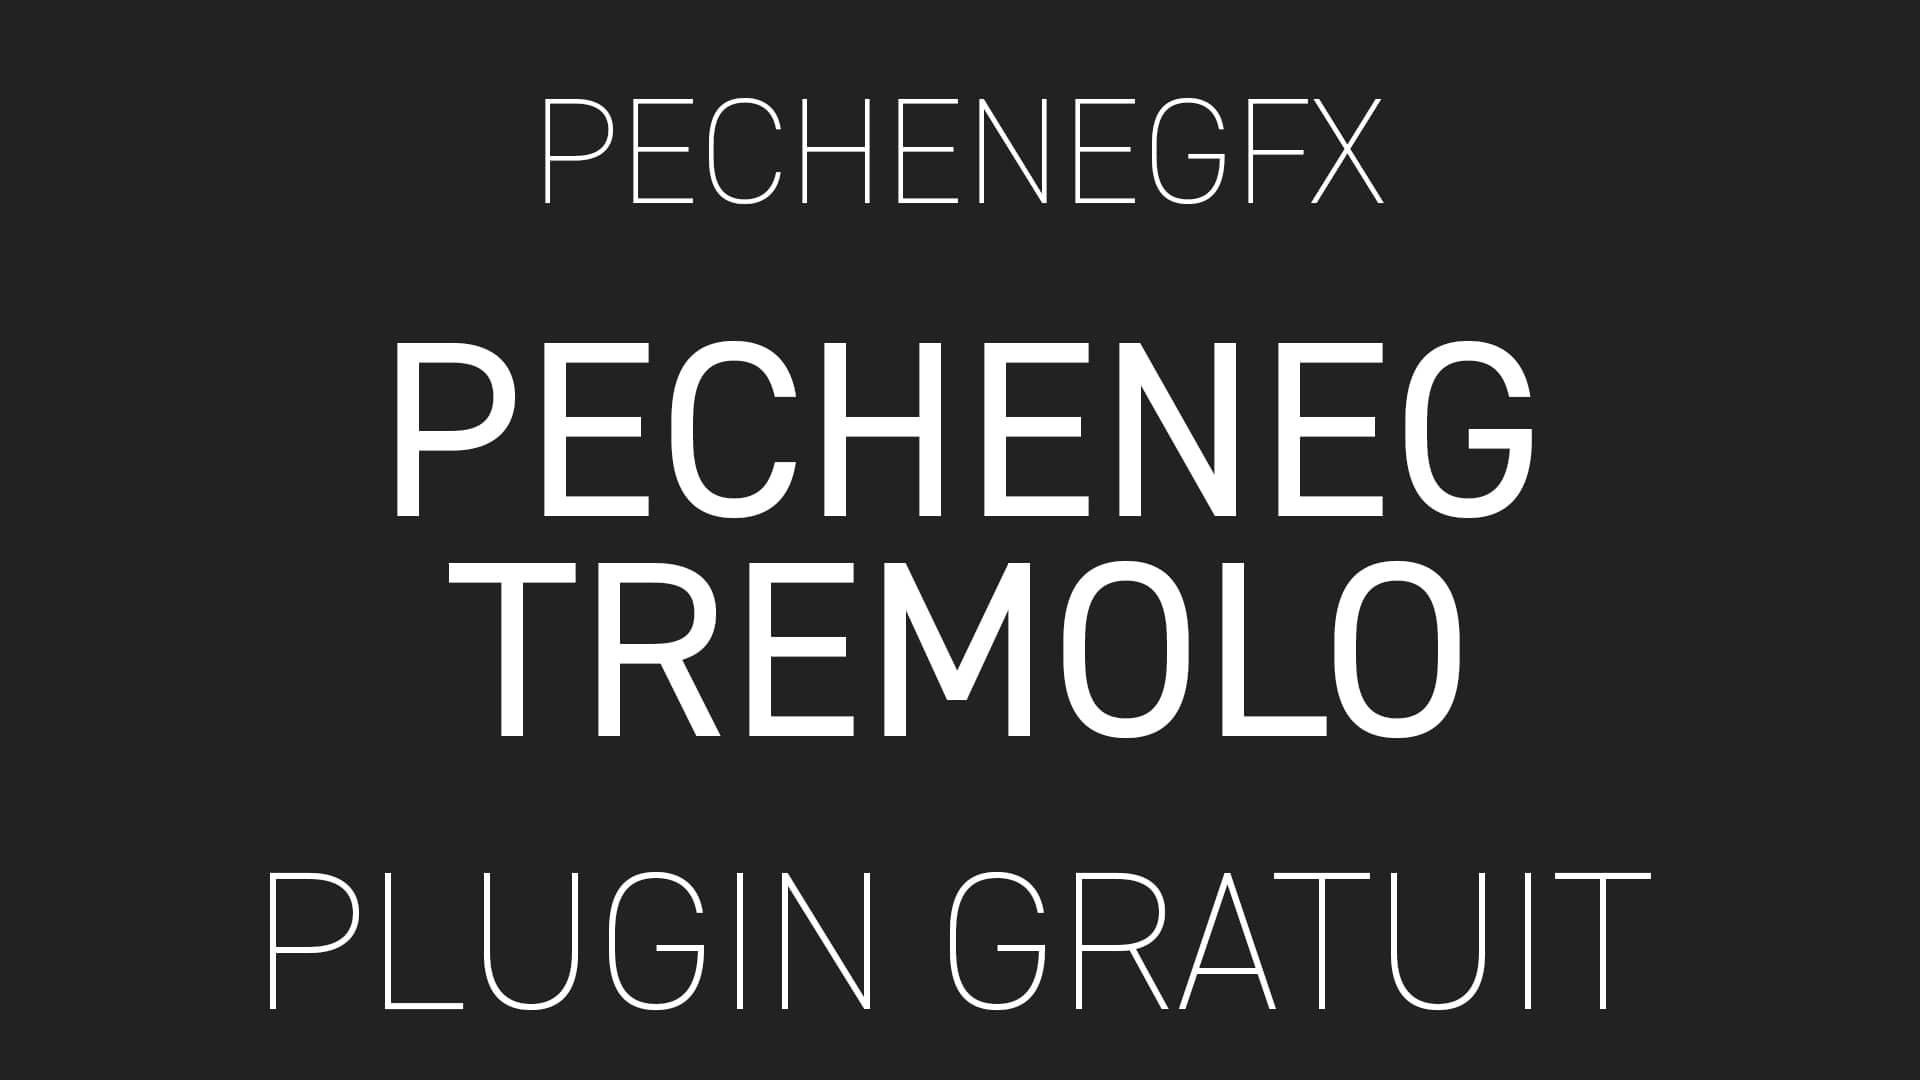 Pecheneg Tremolo de PechenegFX Plugin Gratuit